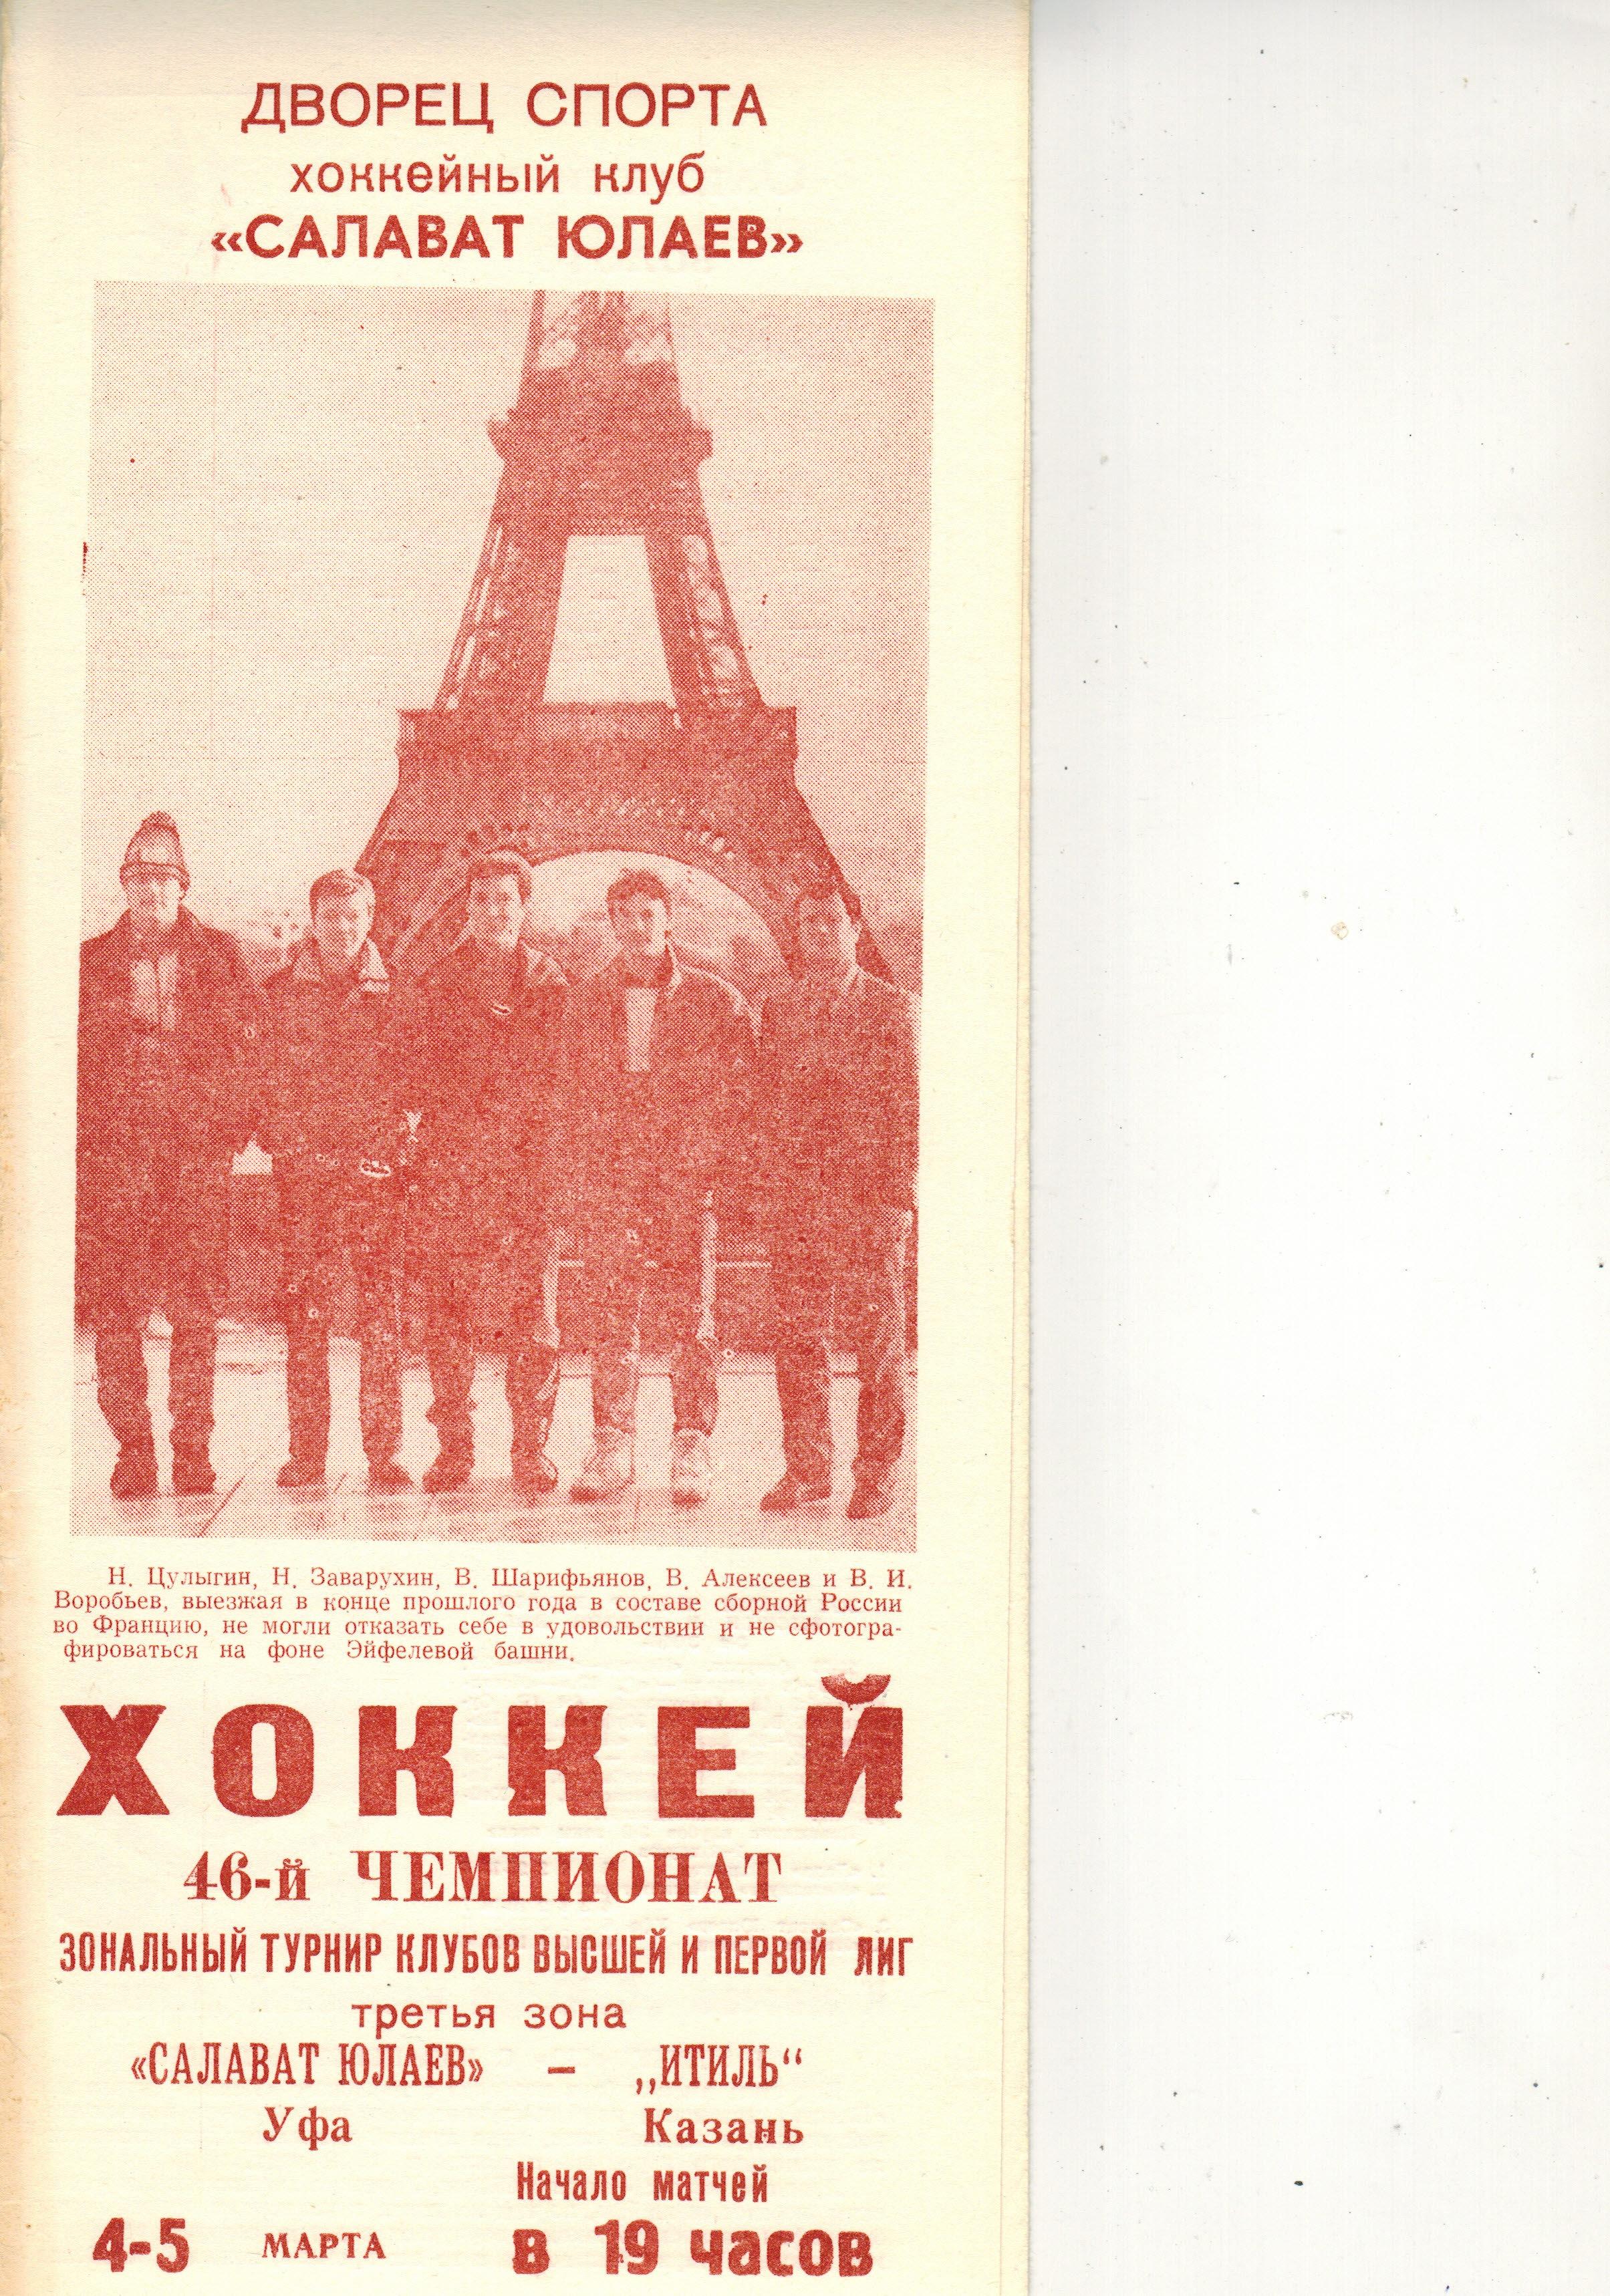 СКСЮ - Итиль 1992.jpg